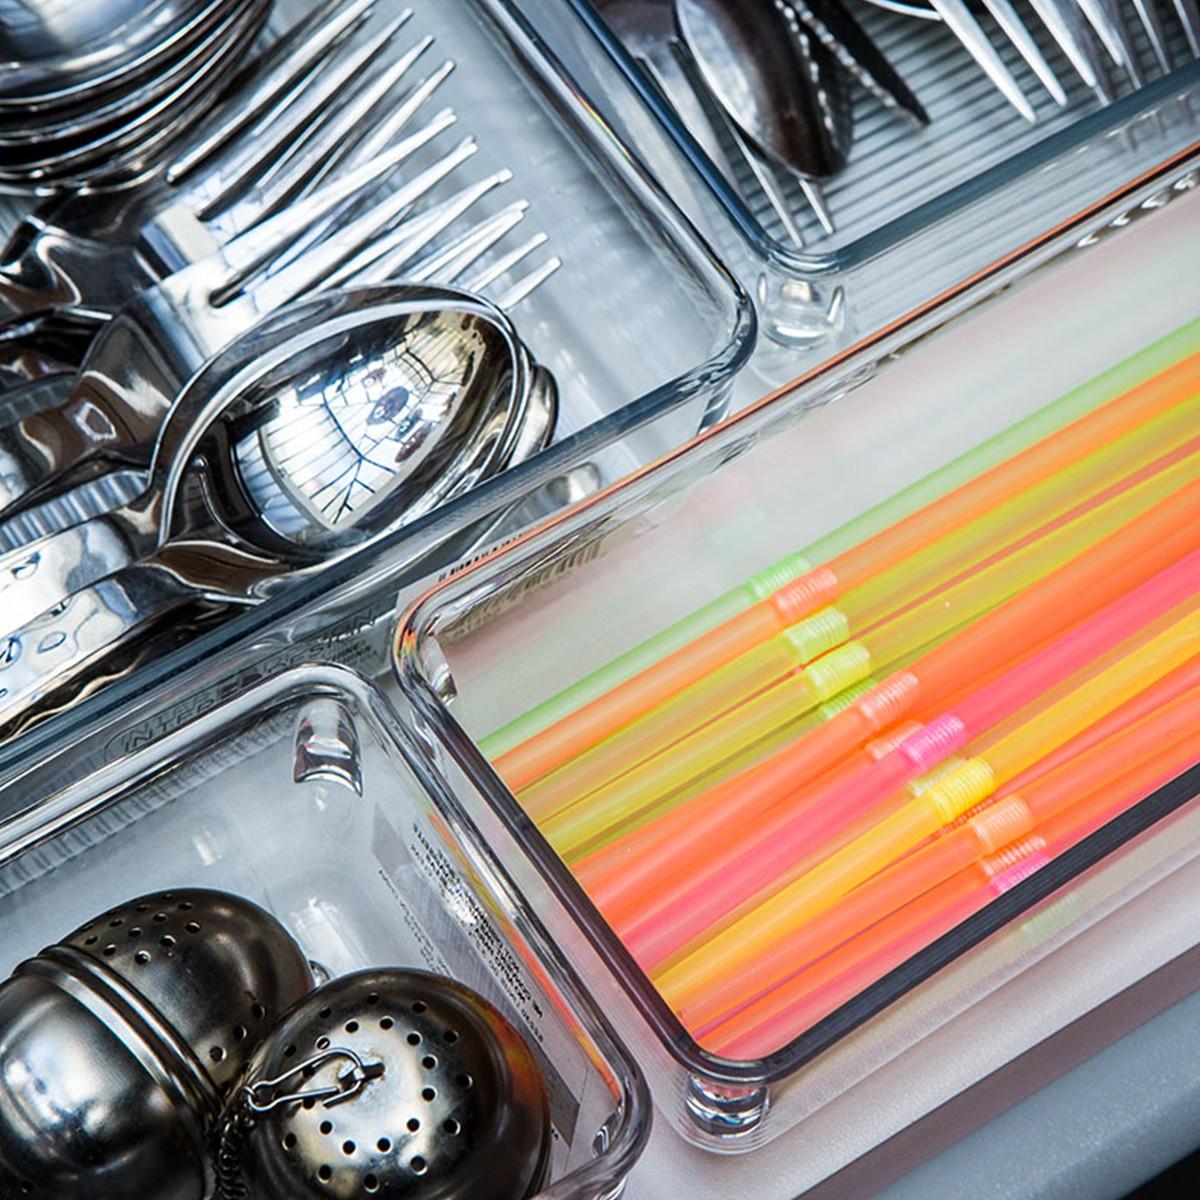 Organiseur de tiroir étroit en acrylique - Salle de bain